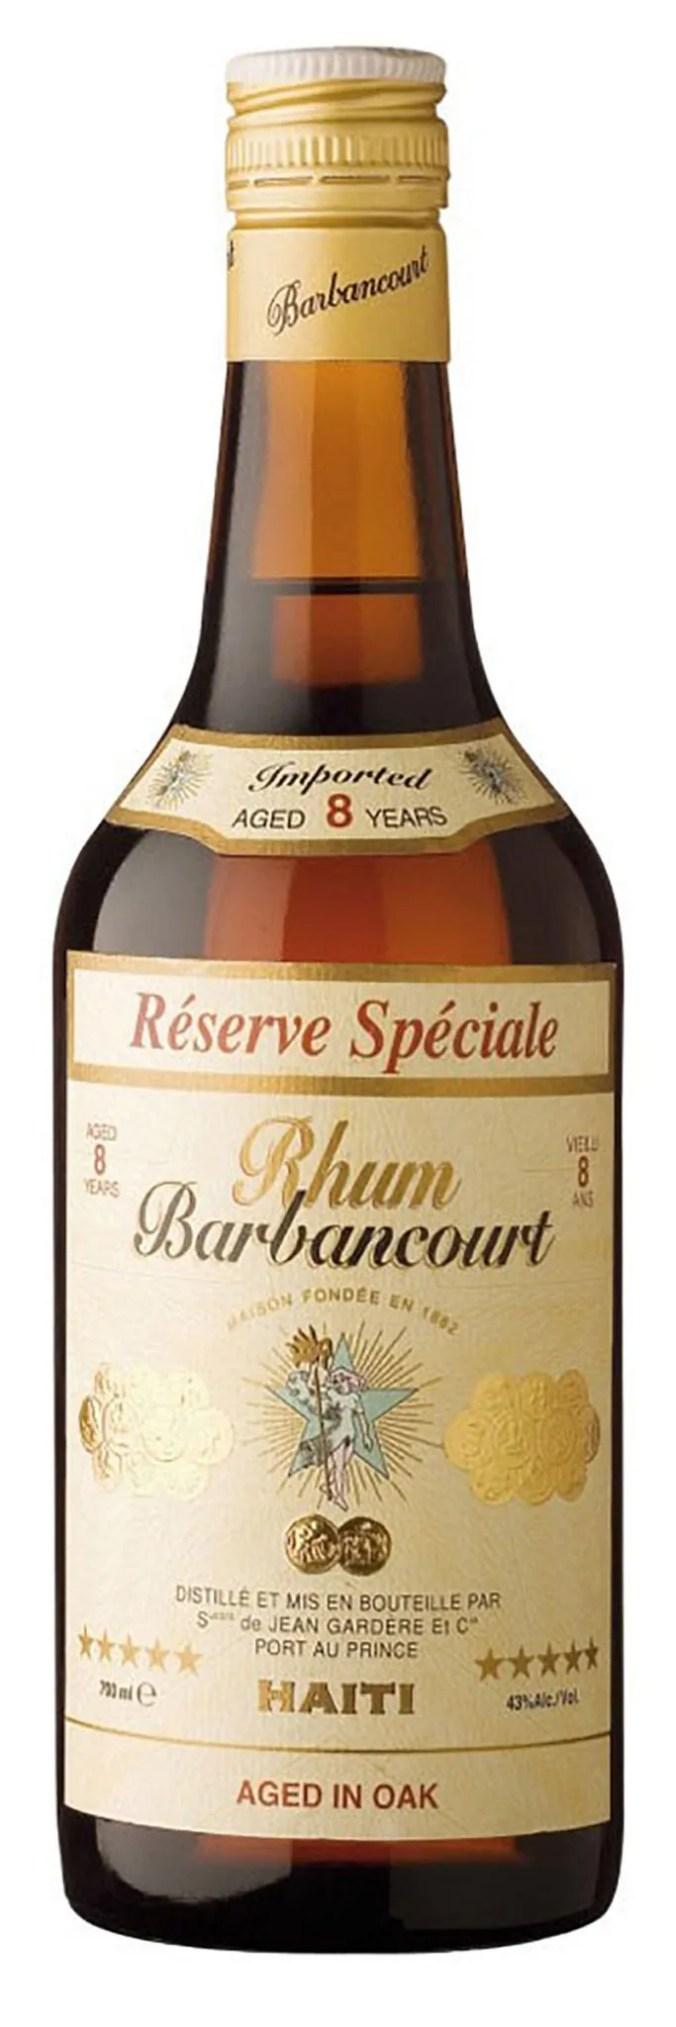 Barbancourt 5 Star eight year old aged rhum from Haiti